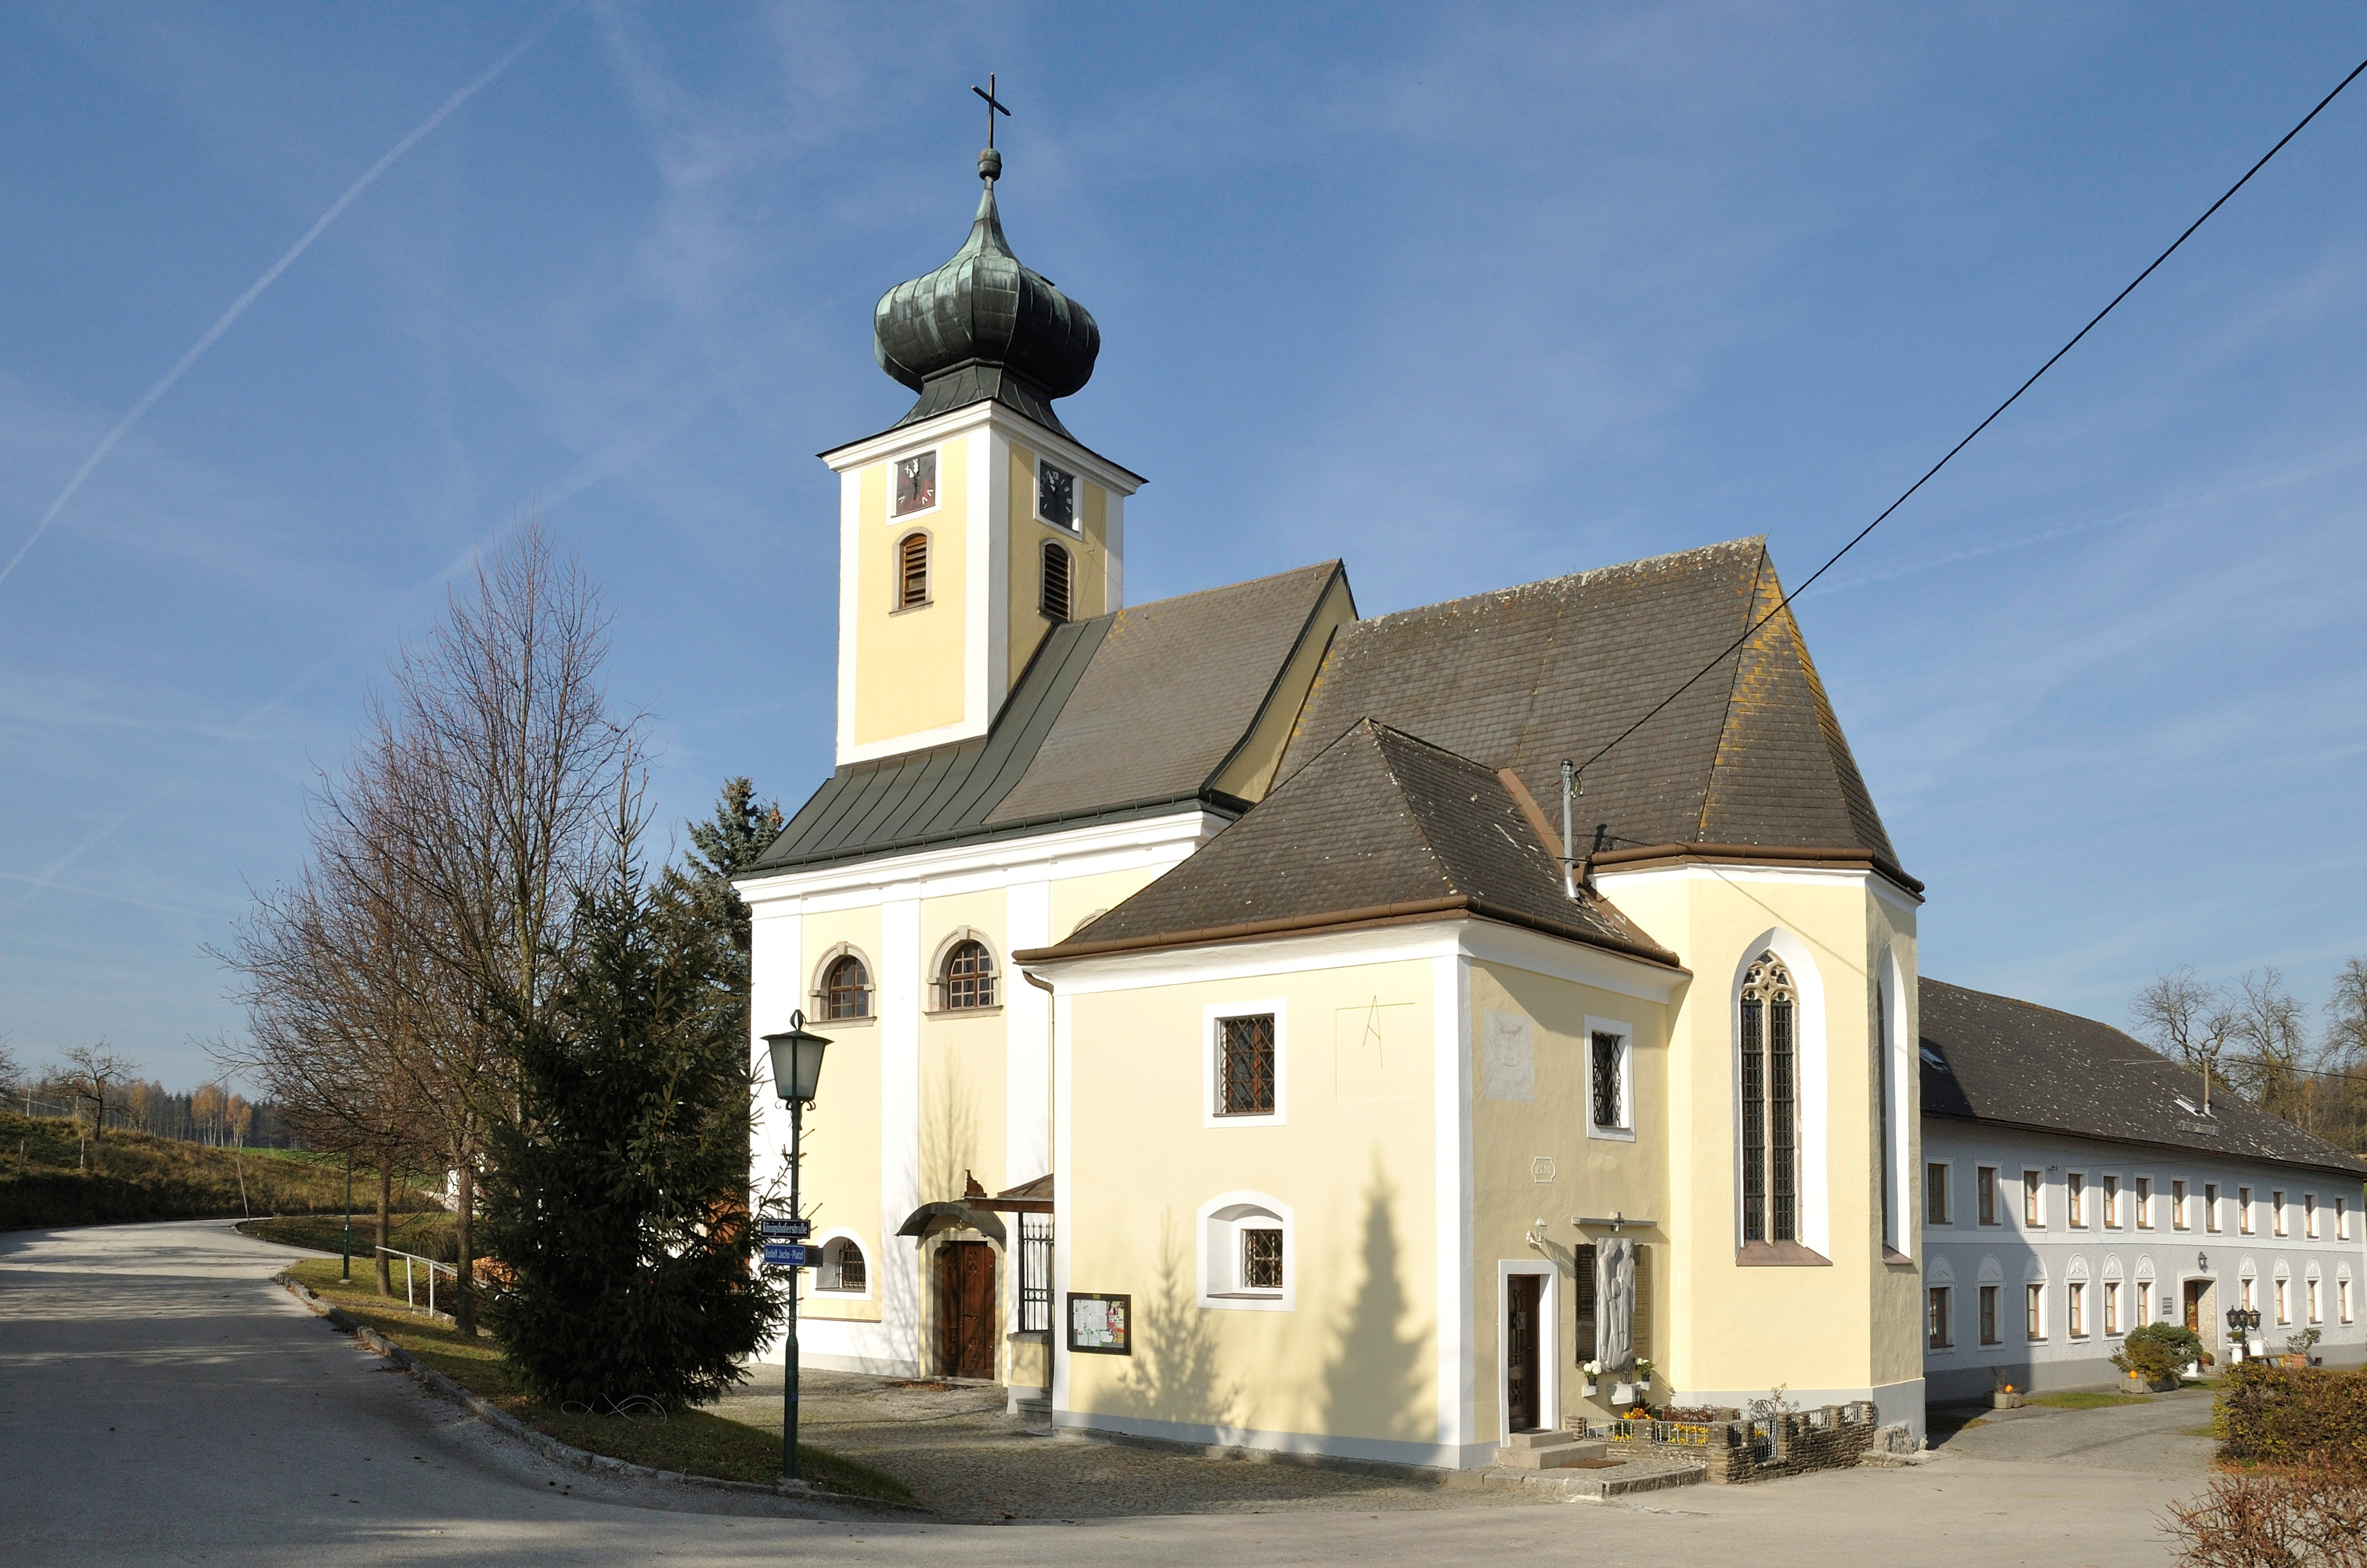 Wolfern, O - Home - Gemeinde Wolfern